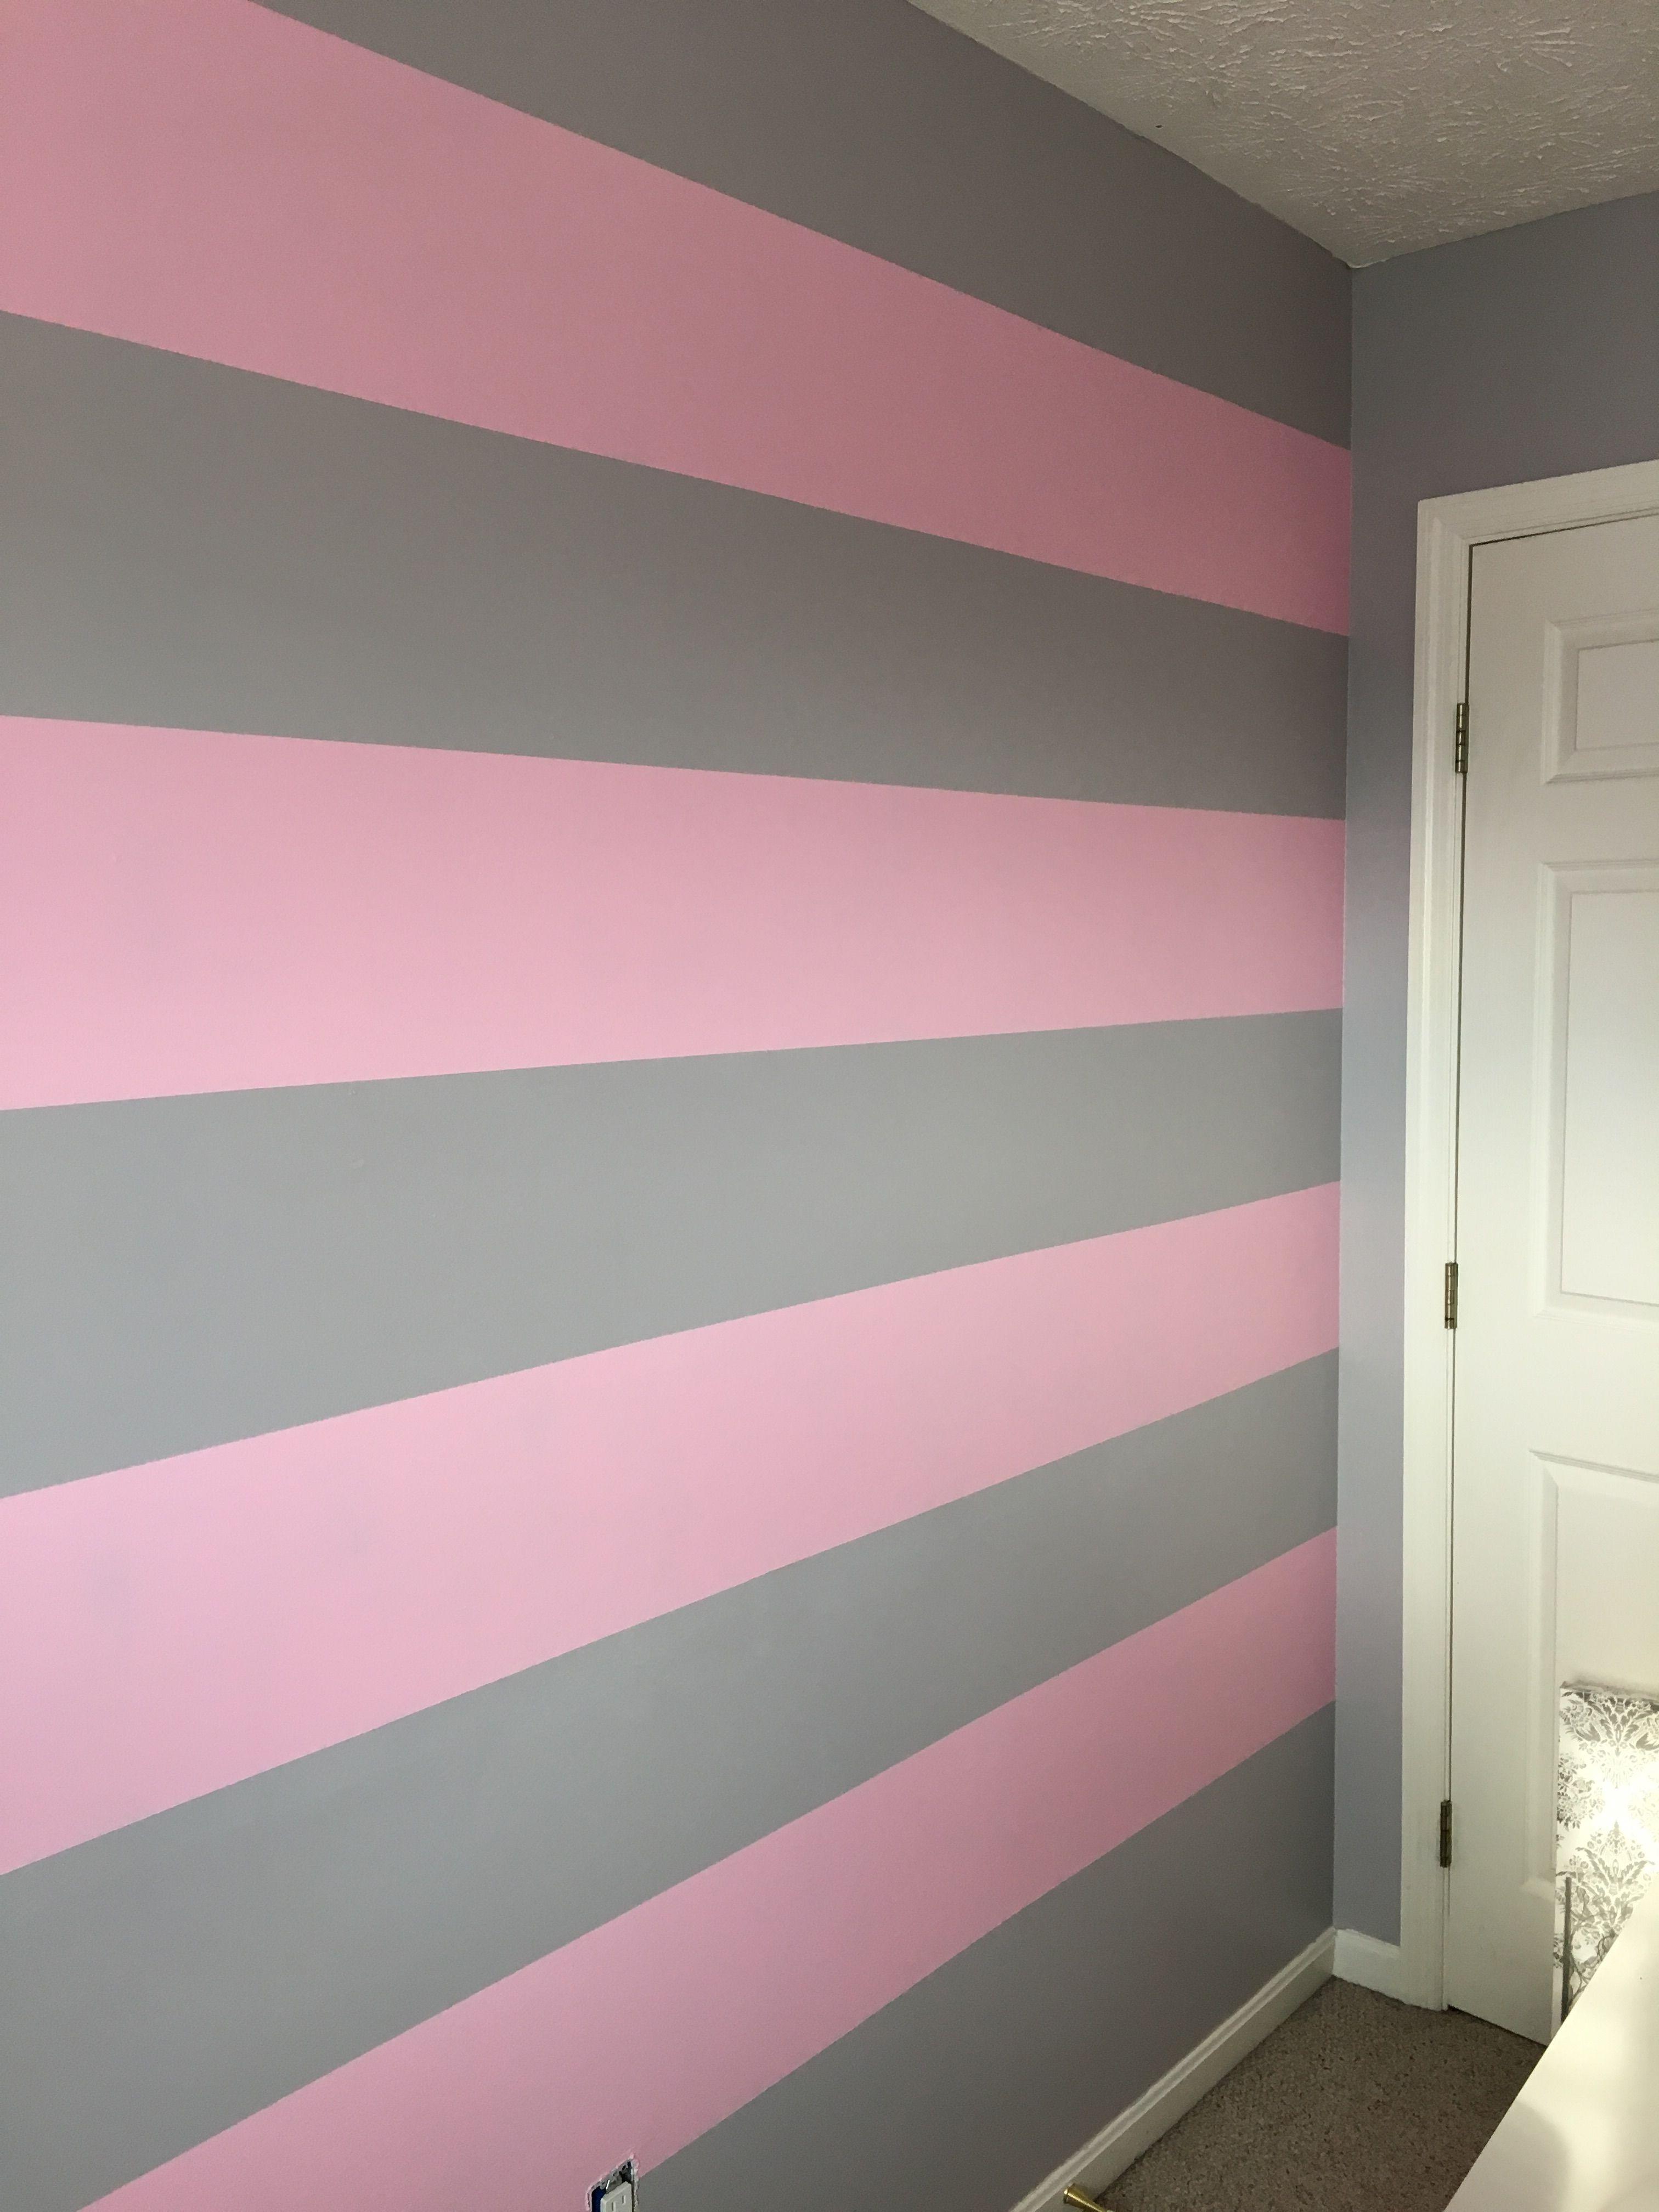 Pink And Gray Striped Wall Decoracao Quarto E Sala Pintura Das